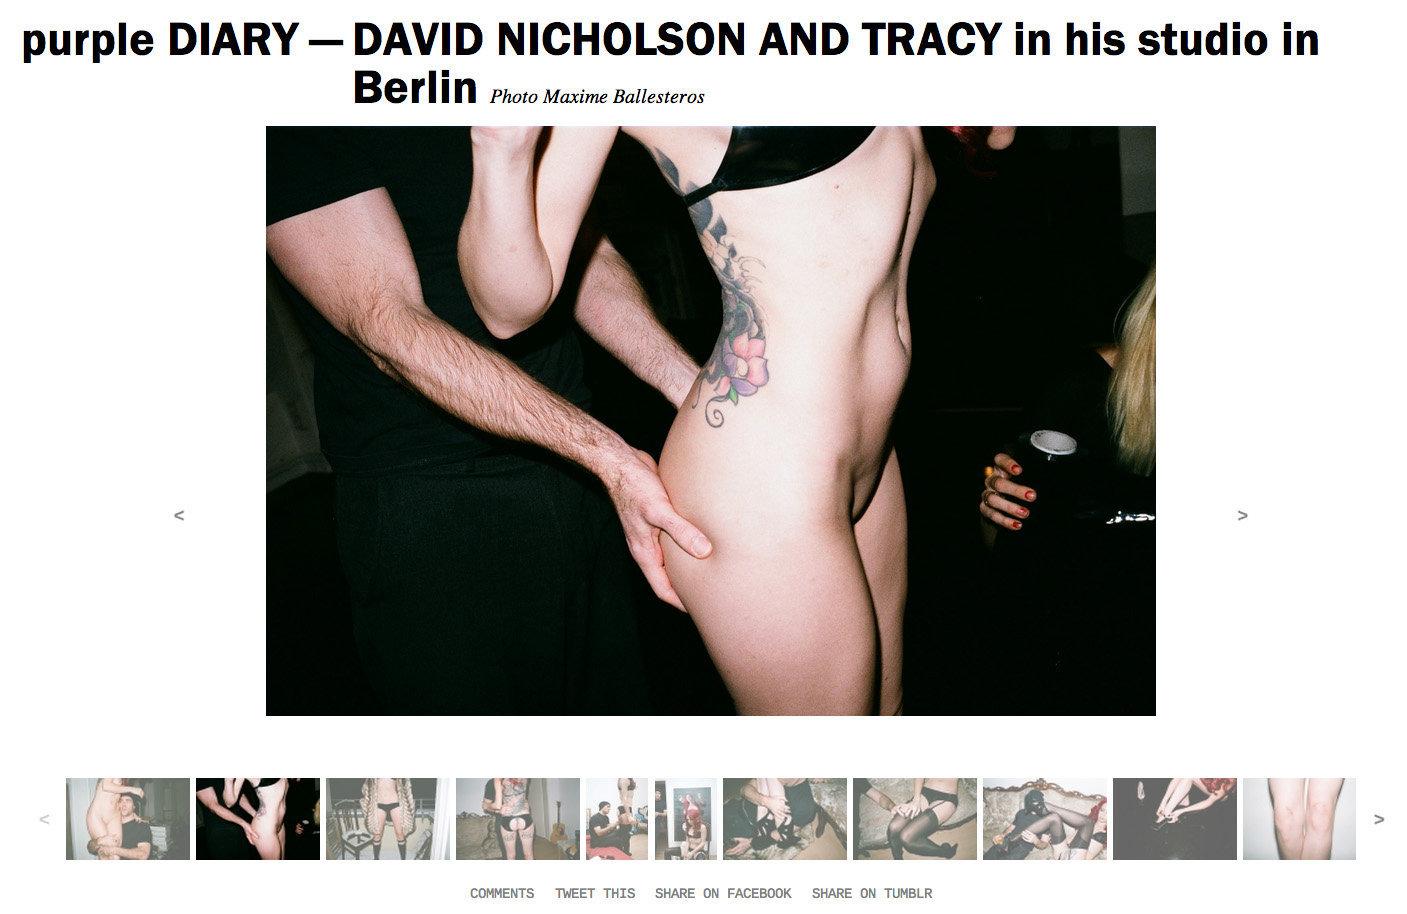 purple DIARY   DAVID NICHOLSON AND TRACY in his studio in Berlin.jpg